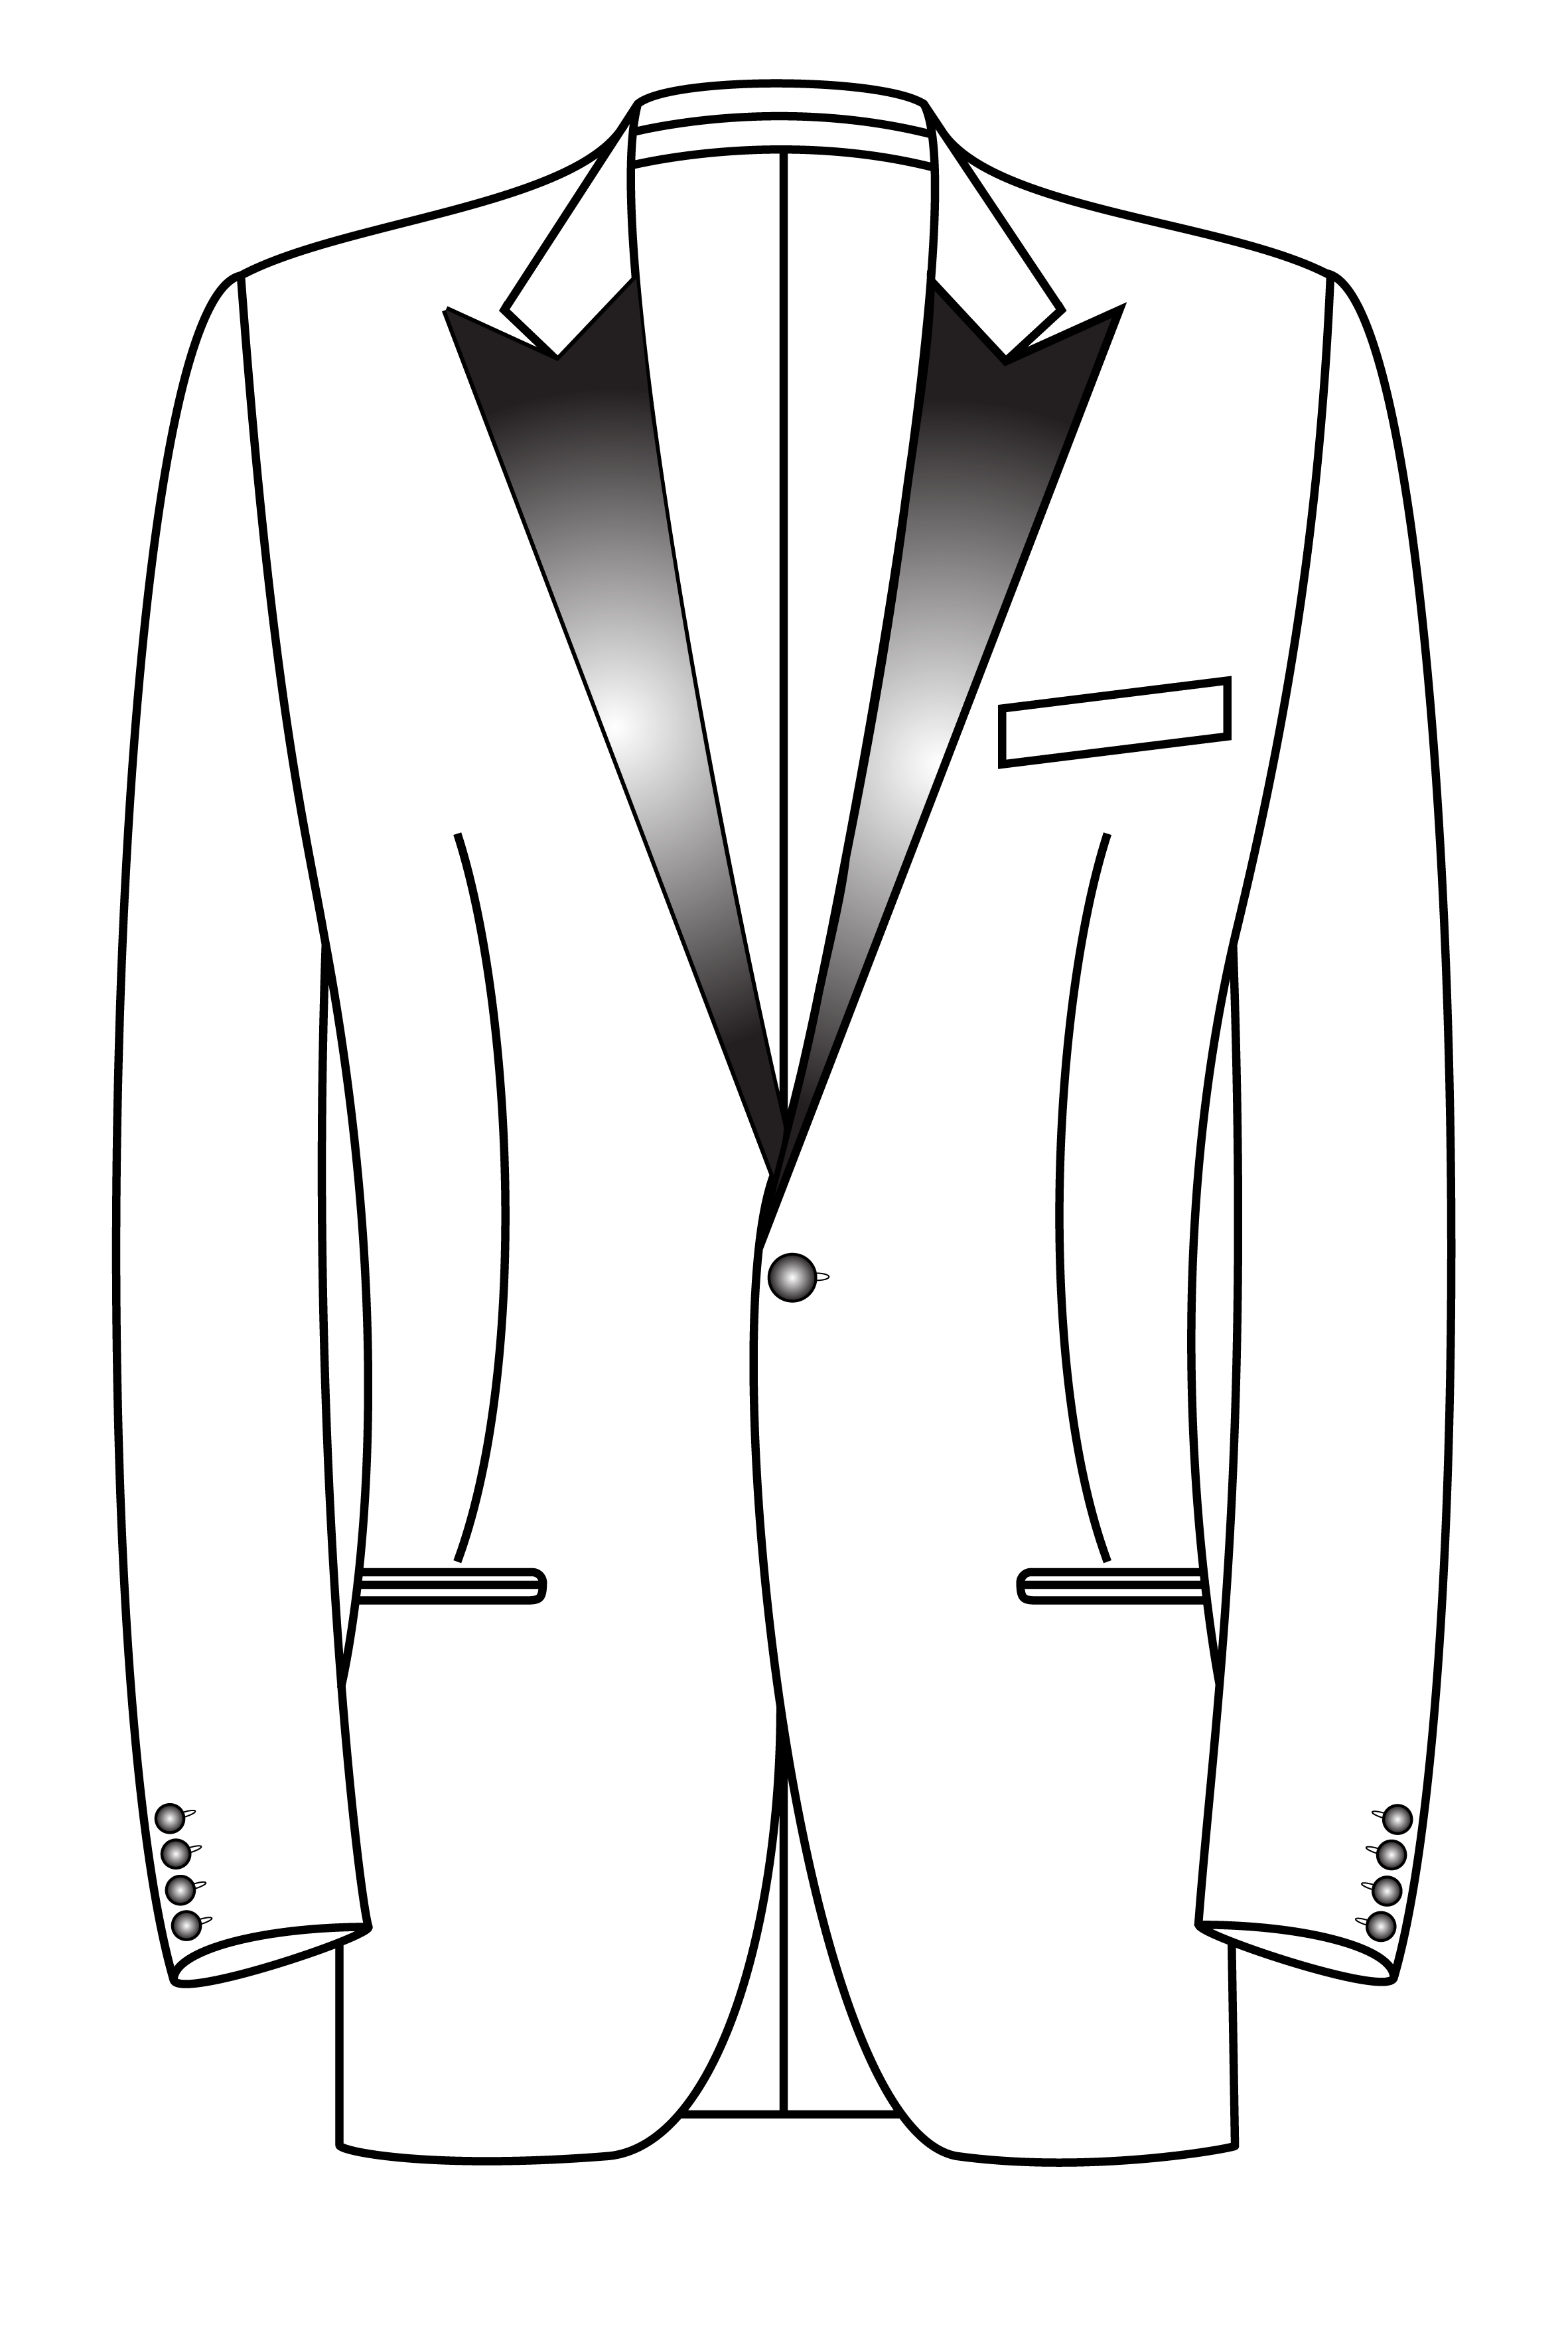 1 knoops peak lapel gepassepoileerde zakken smoking tuxedo dinner jacket.png